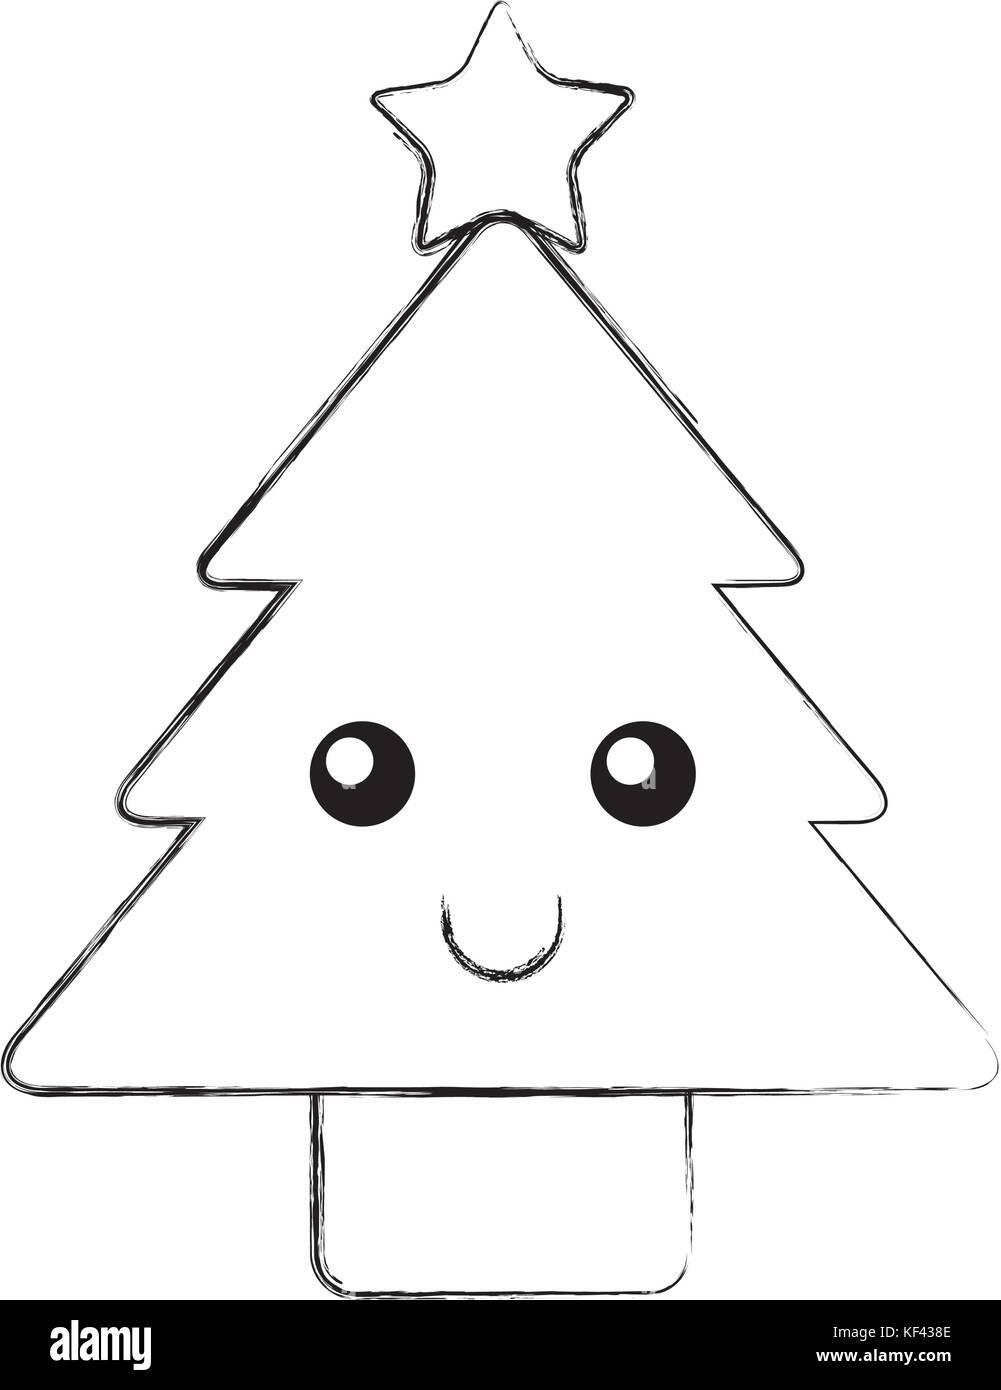 Pine Tree Cartoon Black And White Stock Photos Images Alamy